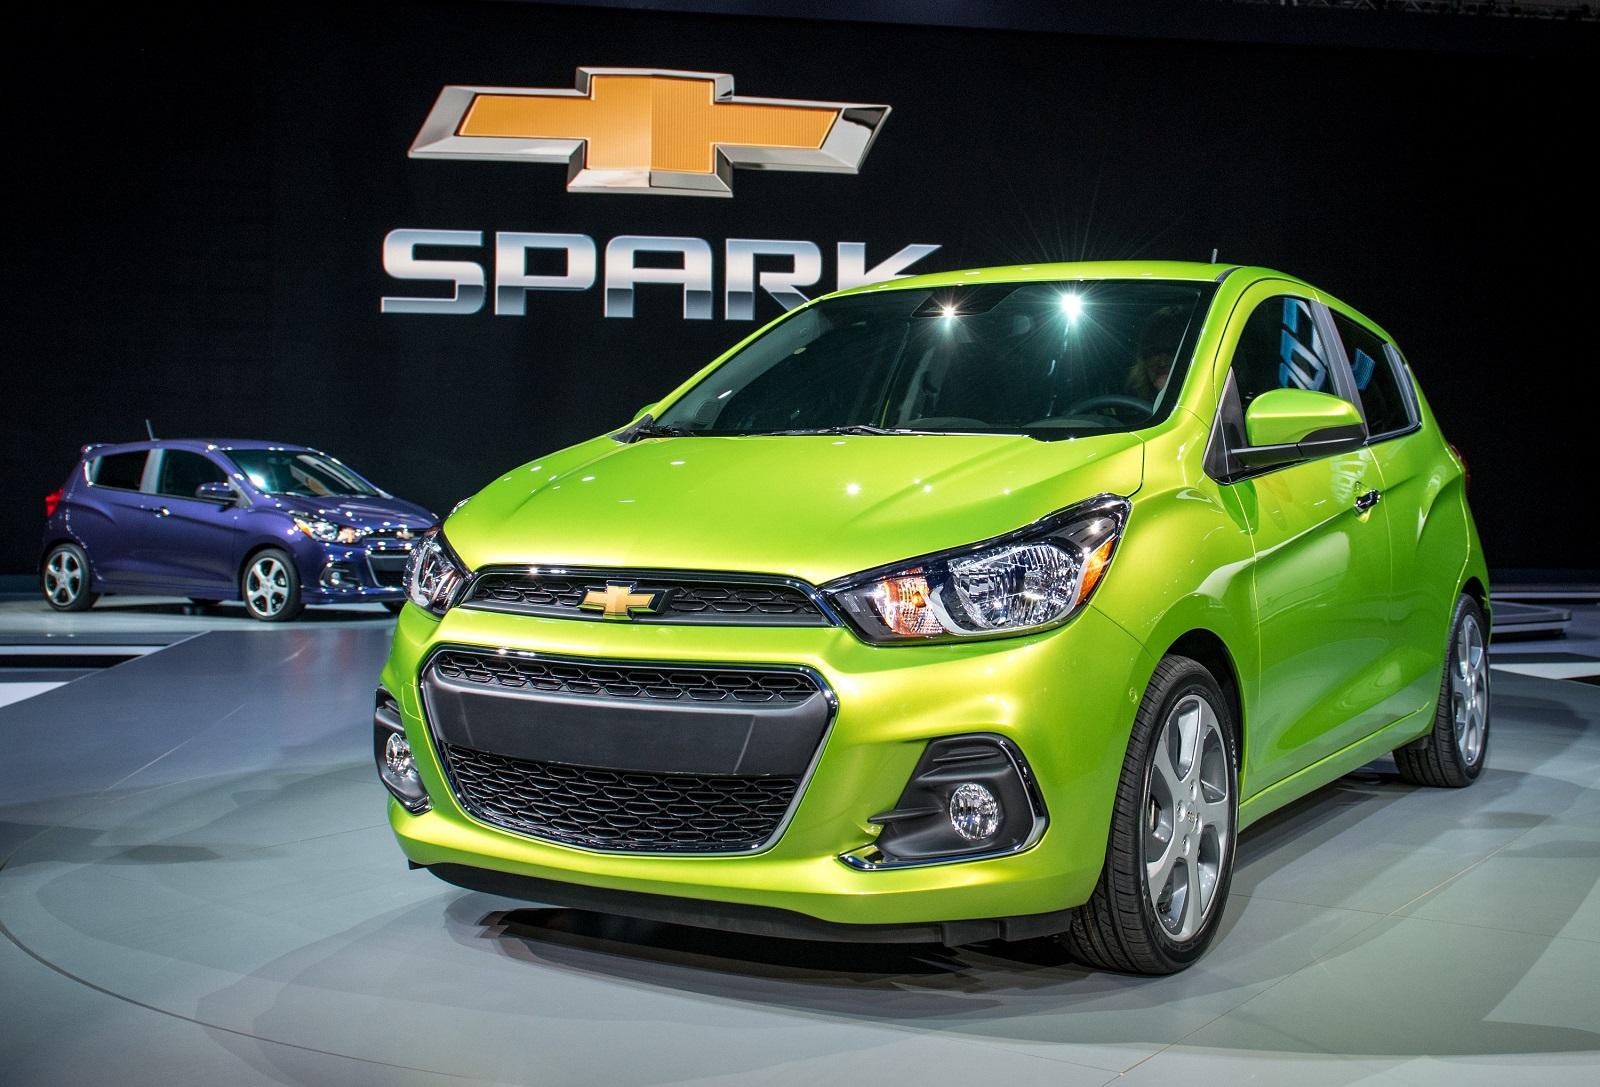 2016 Chevrolet Spark Video Preview